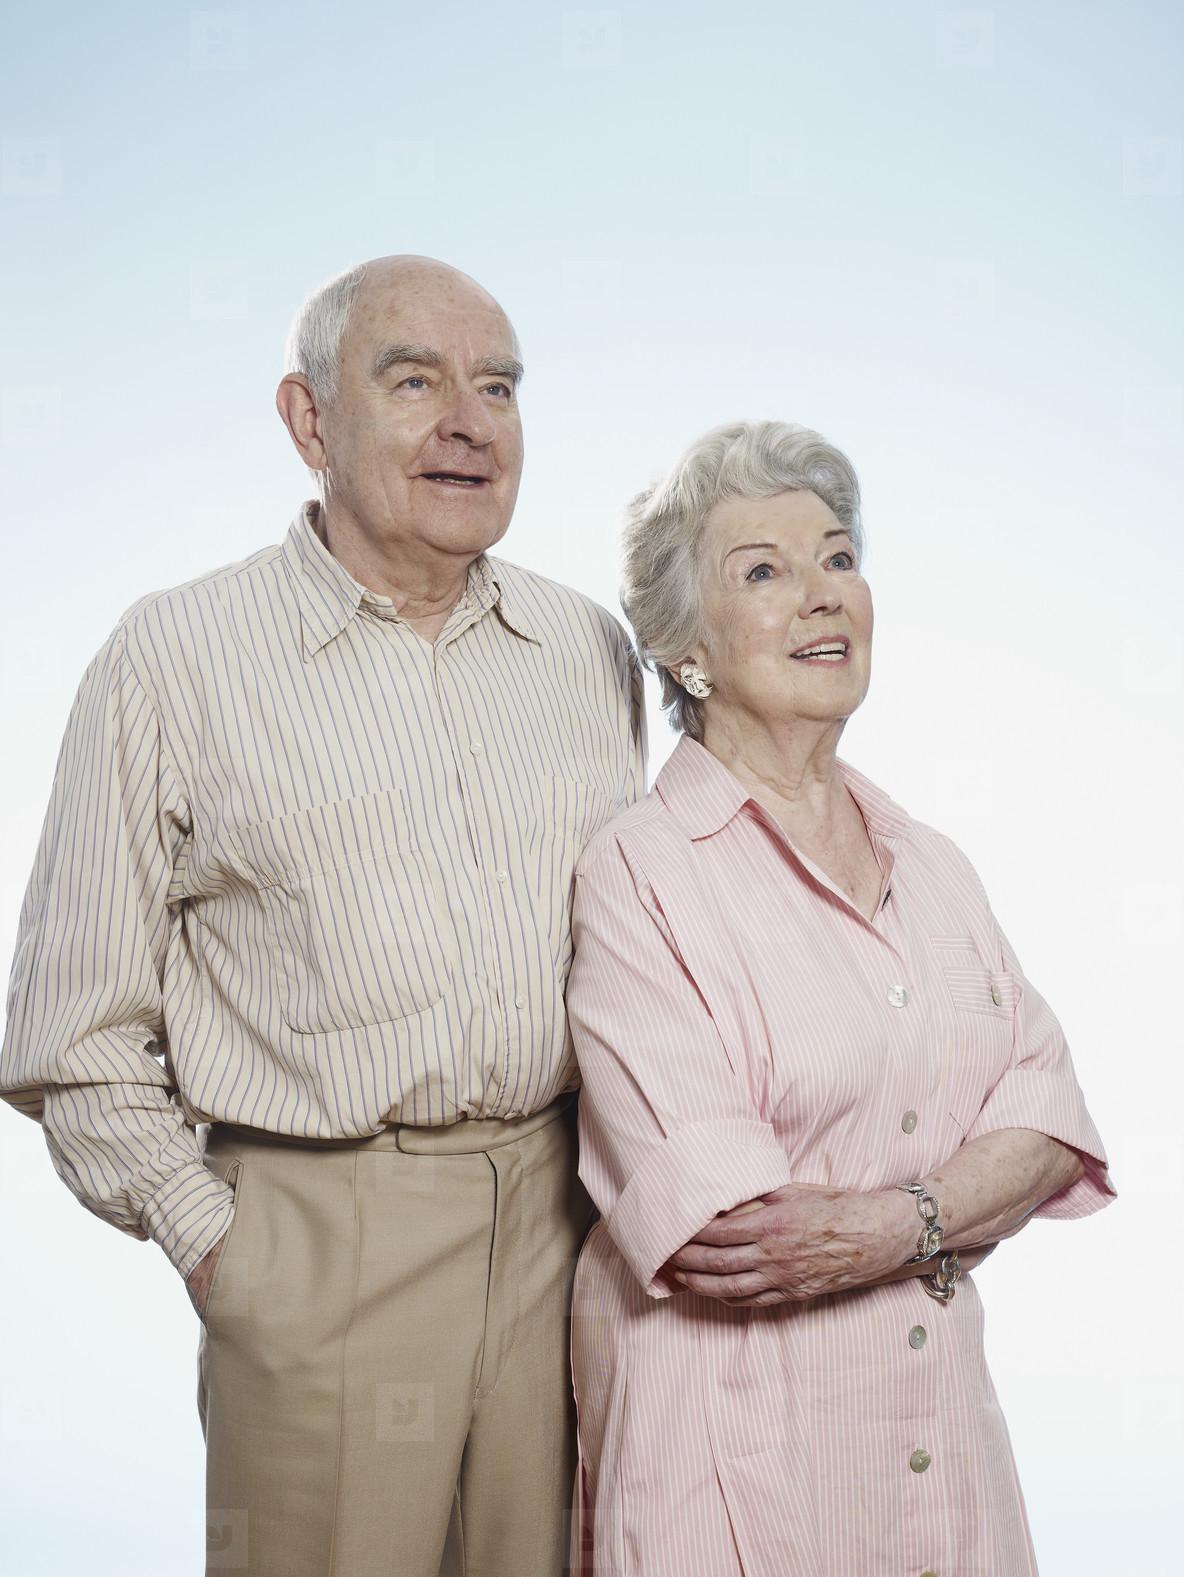 Life of a Senior Couple  54